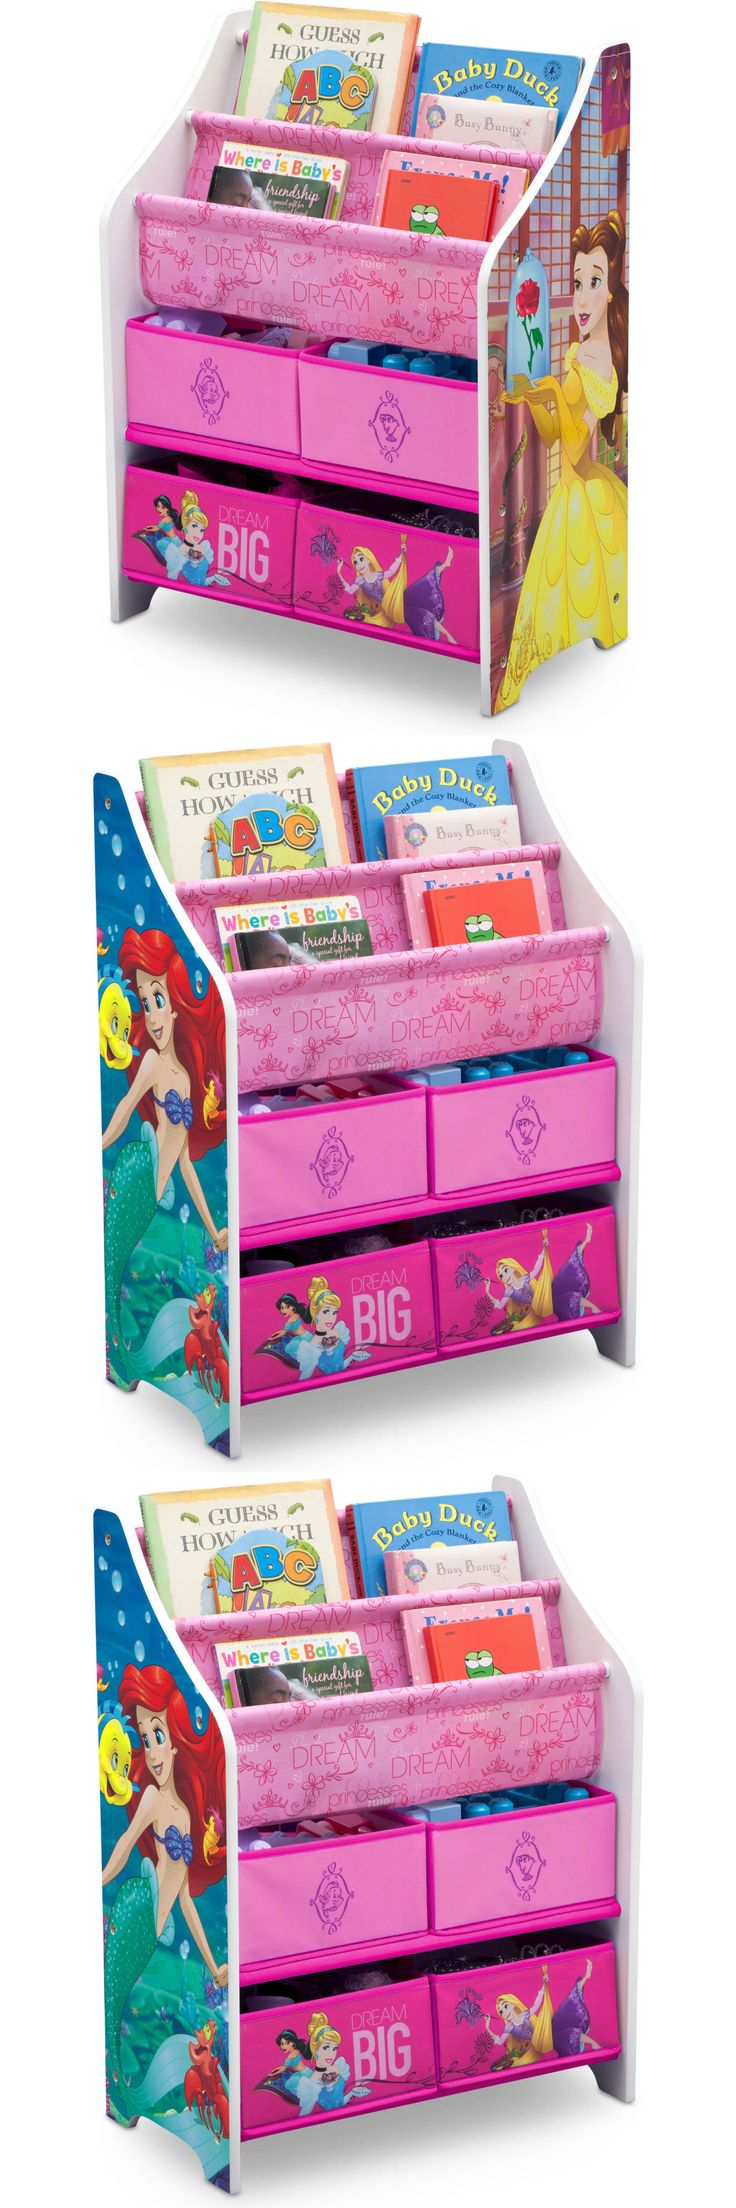 Kids at Home: Children Girls Disney Princess Book Toy Organizer Bedroom Decor Kids Storage -> BUY IT NOW ONLY: $47.95 on eBay!